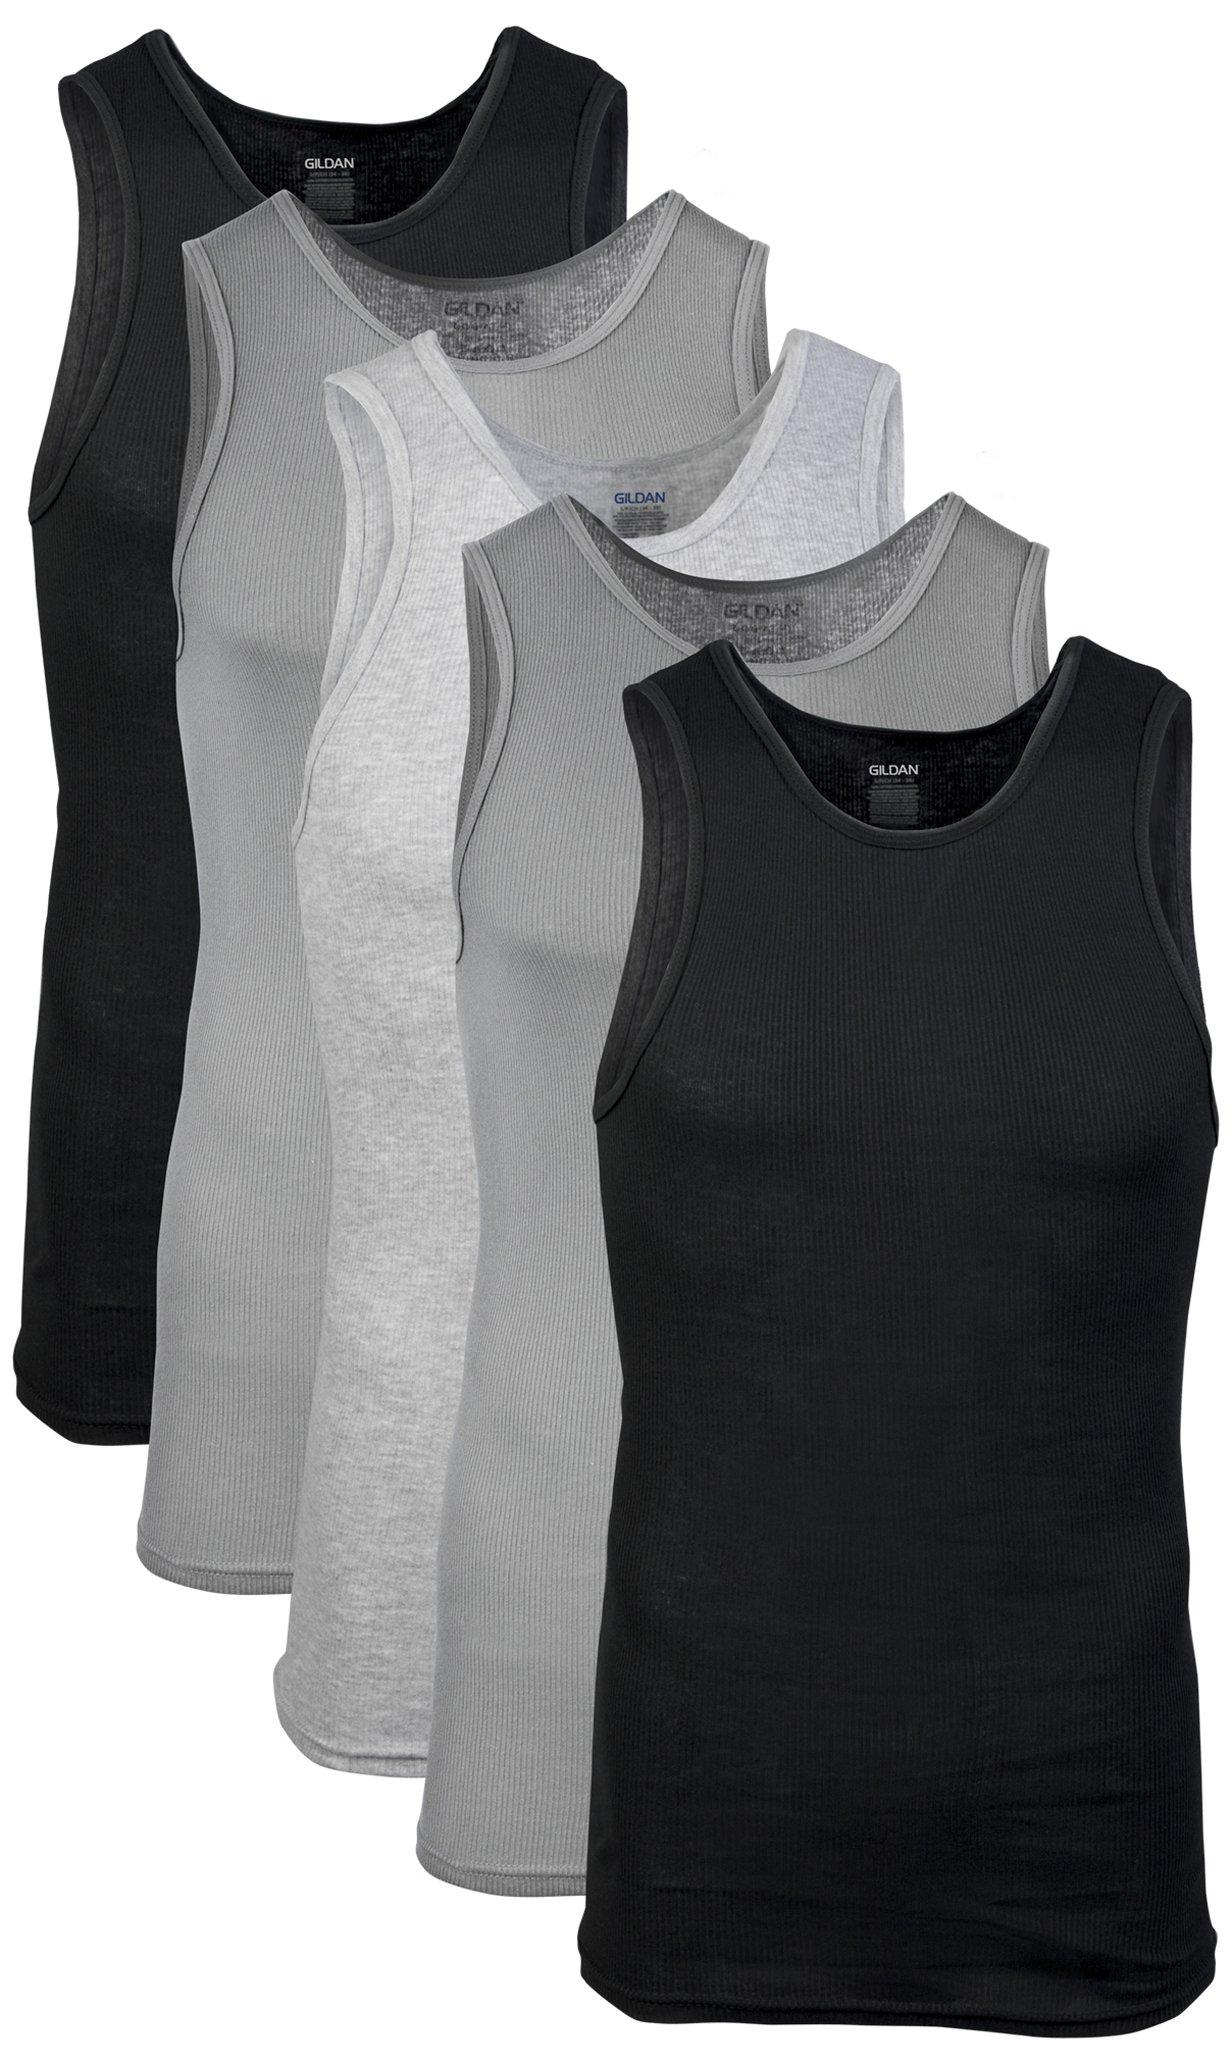 Gildan Men's A-Shirts 5 Pack, Grey/Black, Large